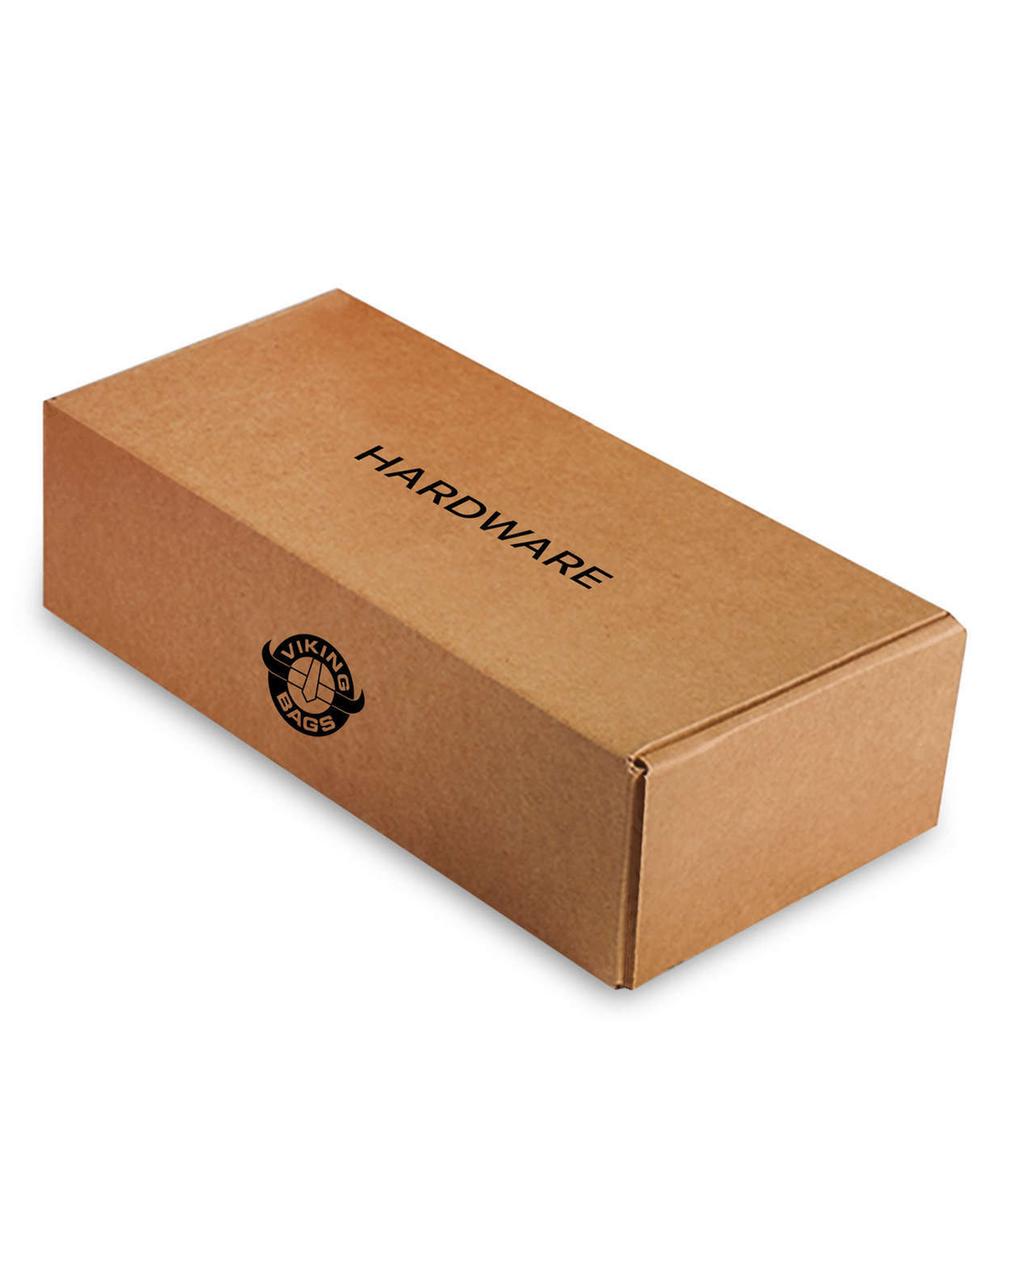 Honda VTX 1300 C Medium Warrior Motorcycle Saddlebags Hardware Box